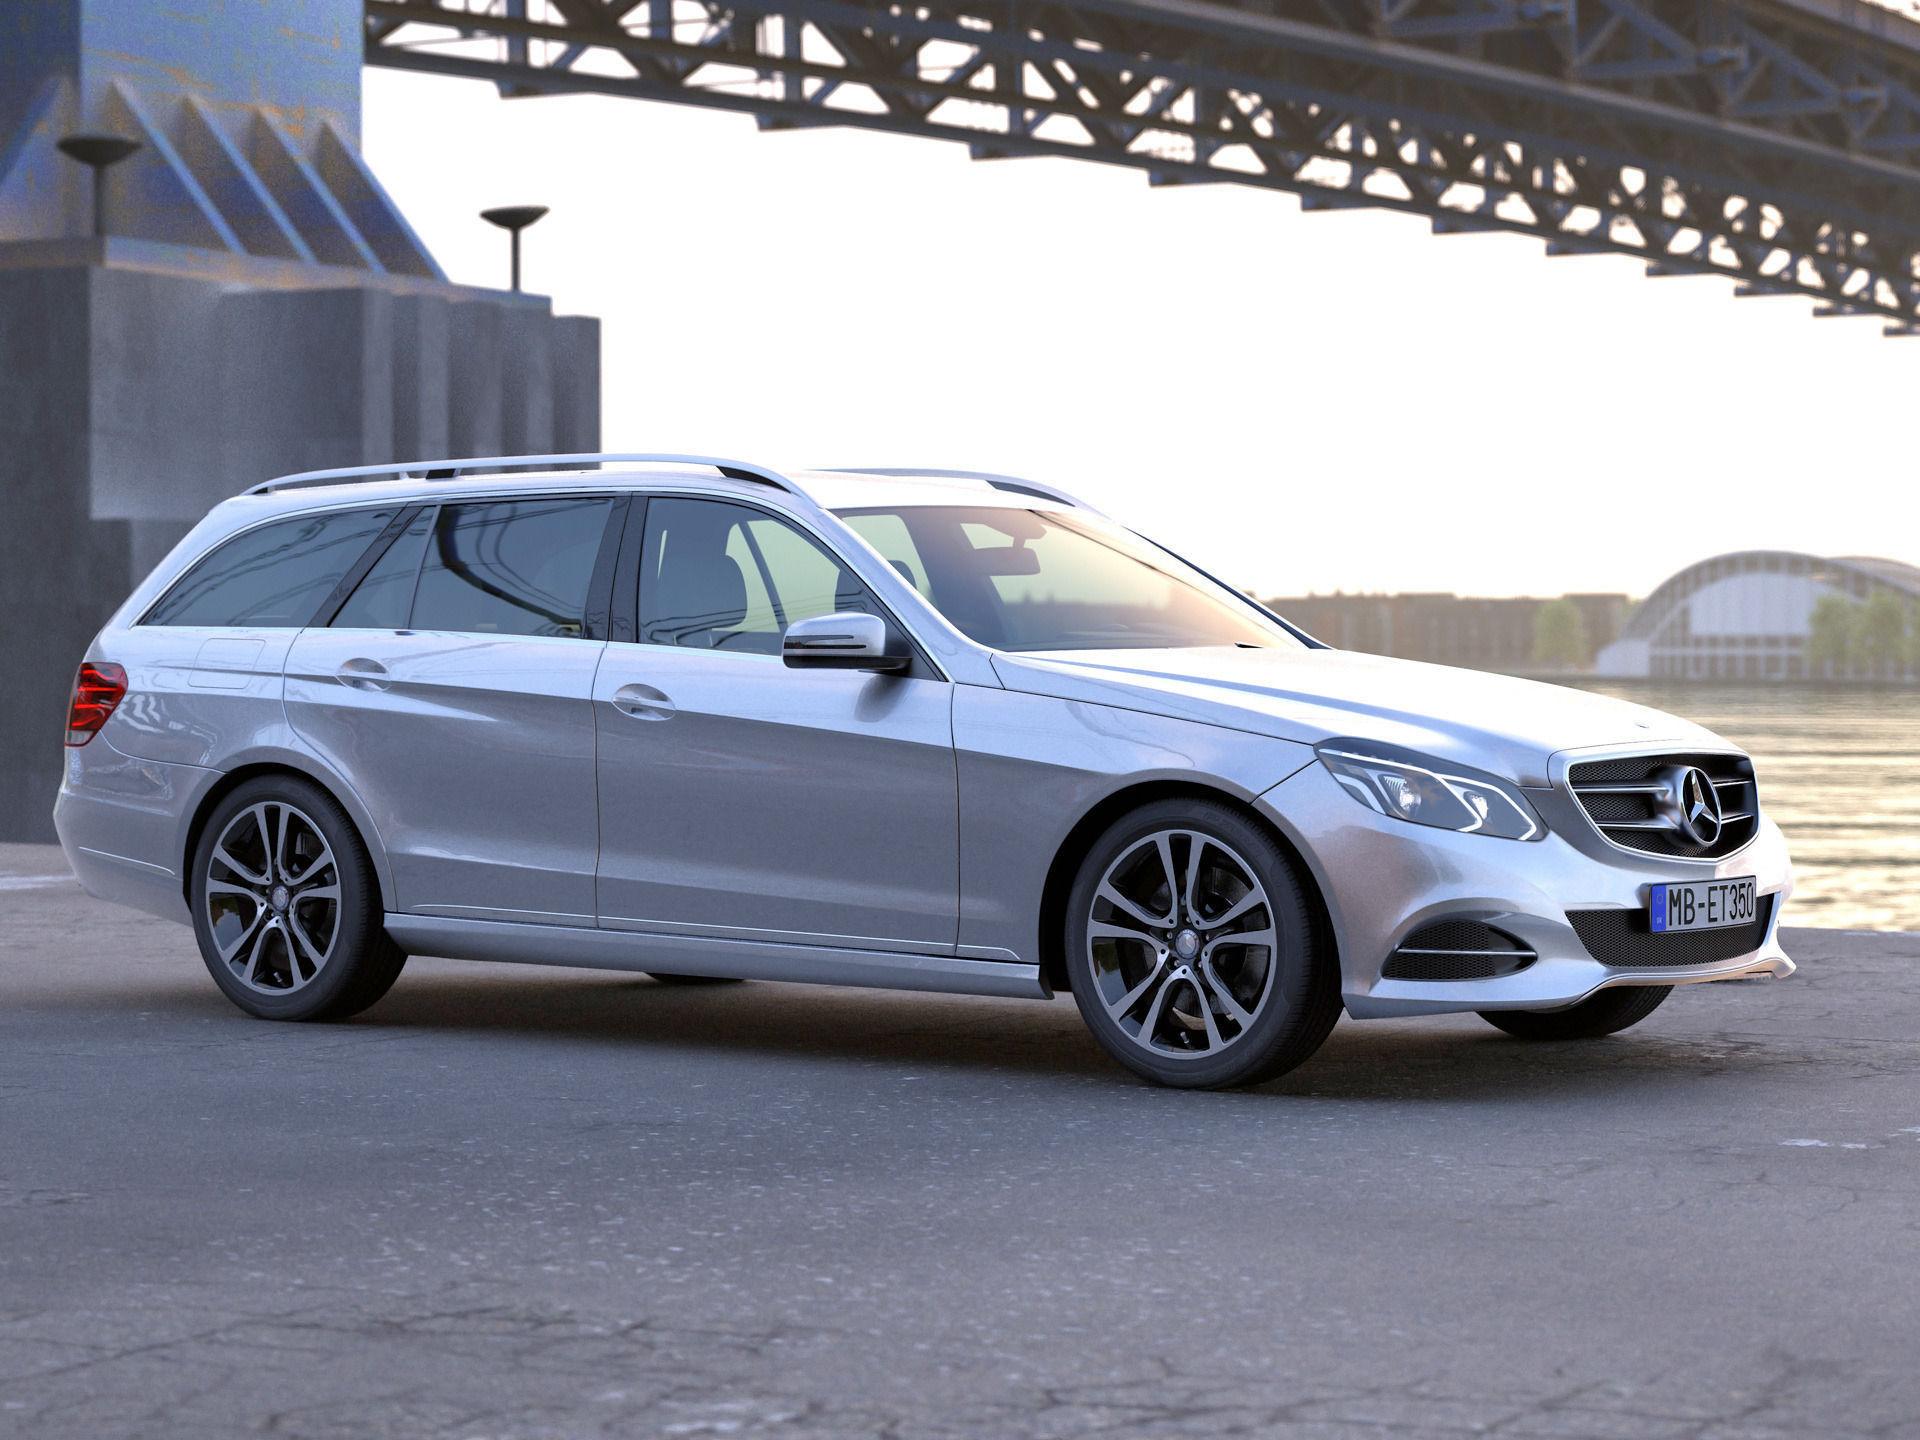 Mercedes benz e class t model 2014 3d model animated for Mercedes benz 2014 suv models